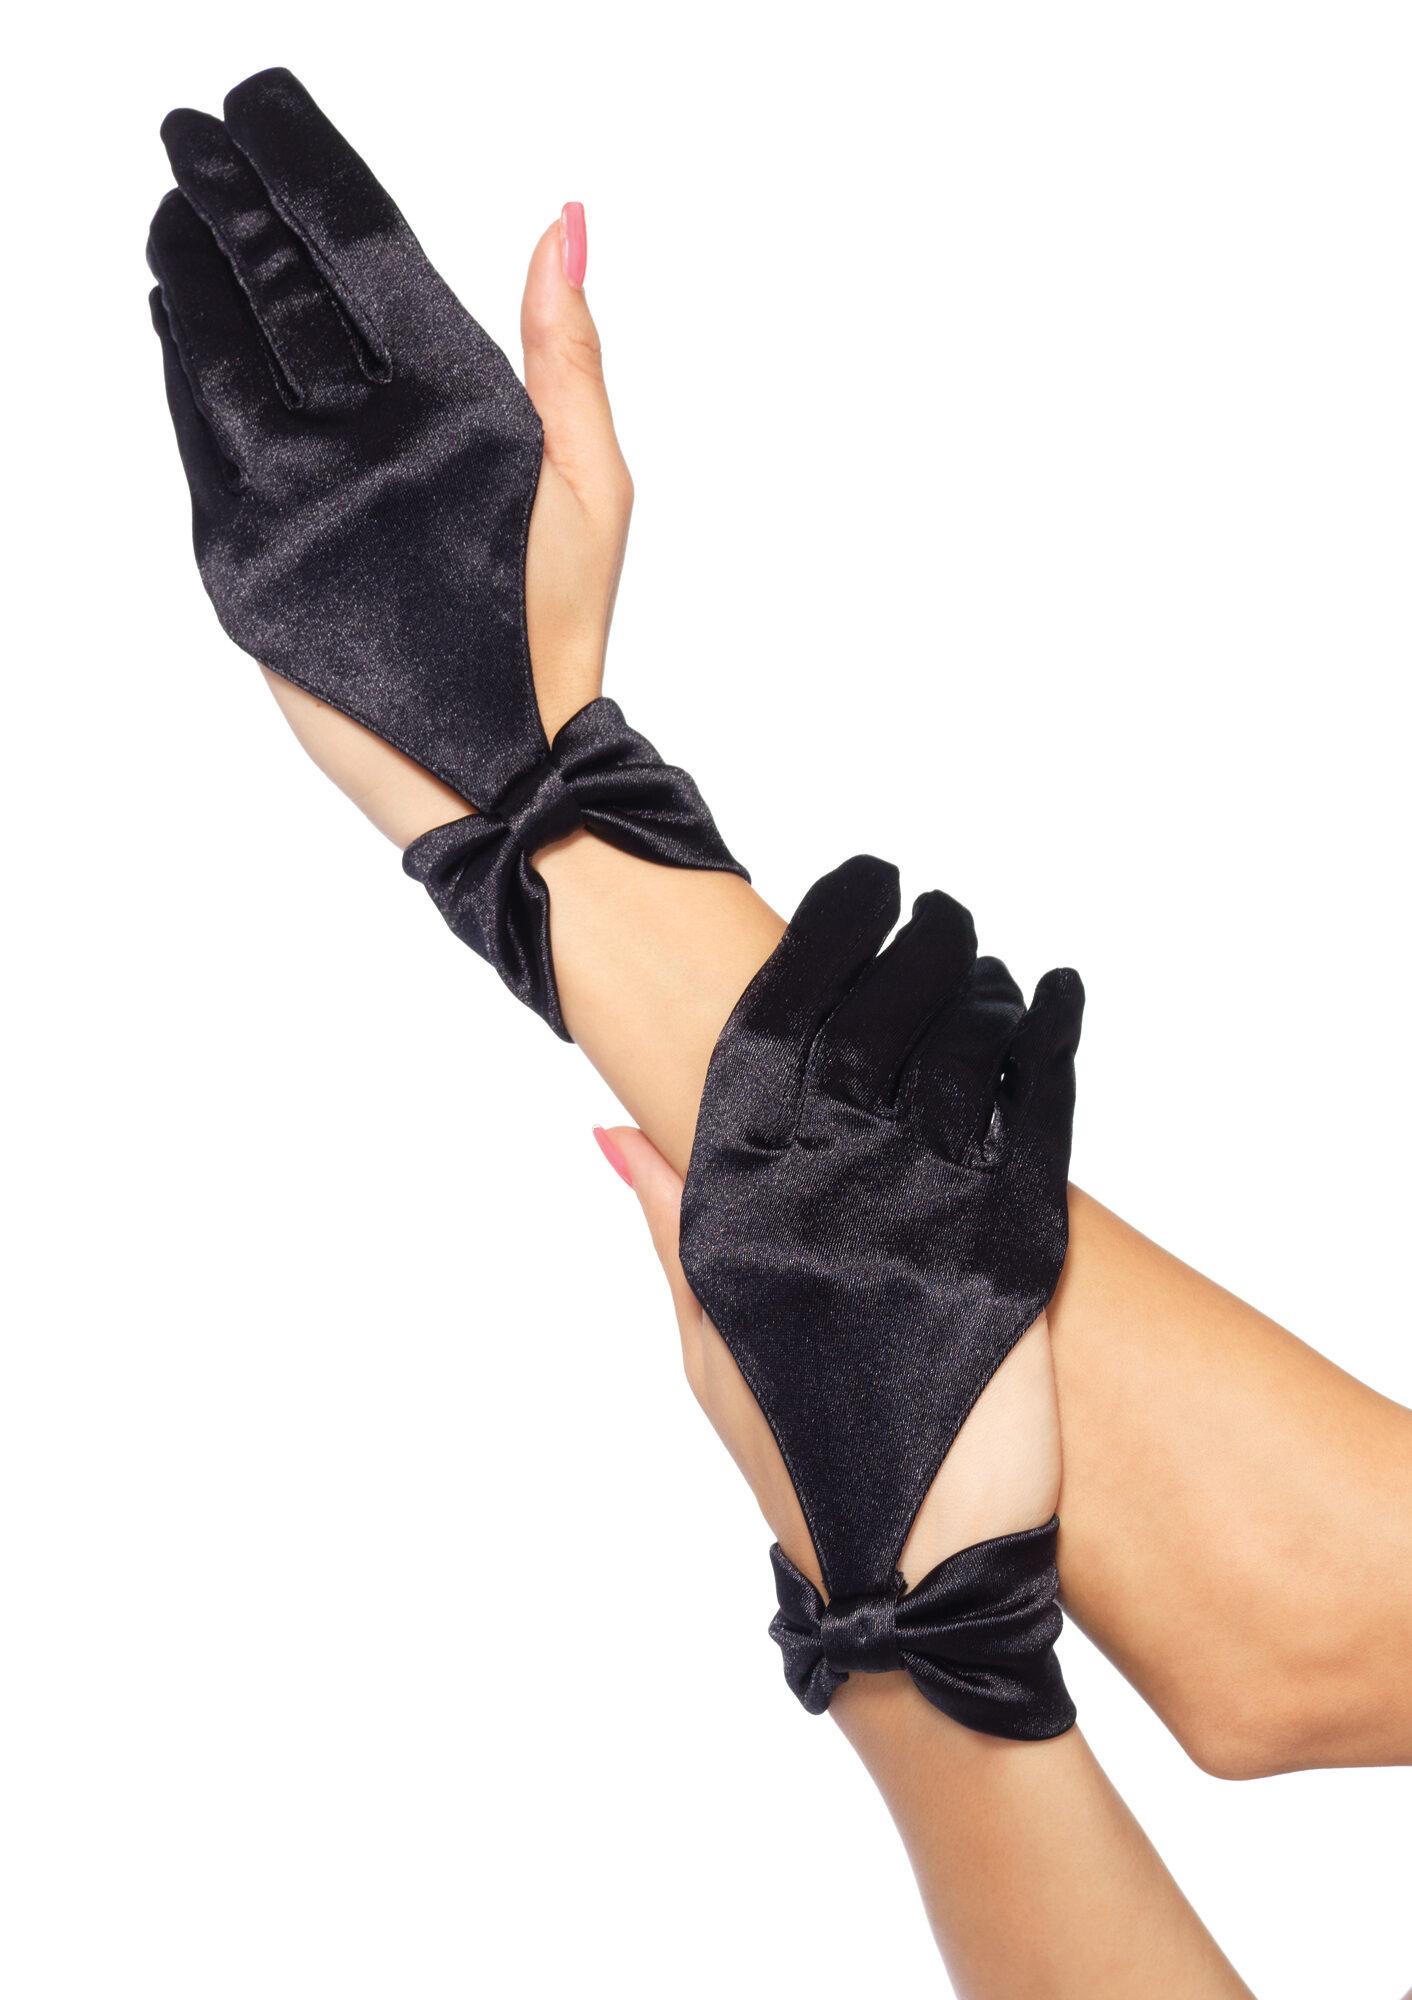 Black gloves with bow - Black Gloves With Bow 9